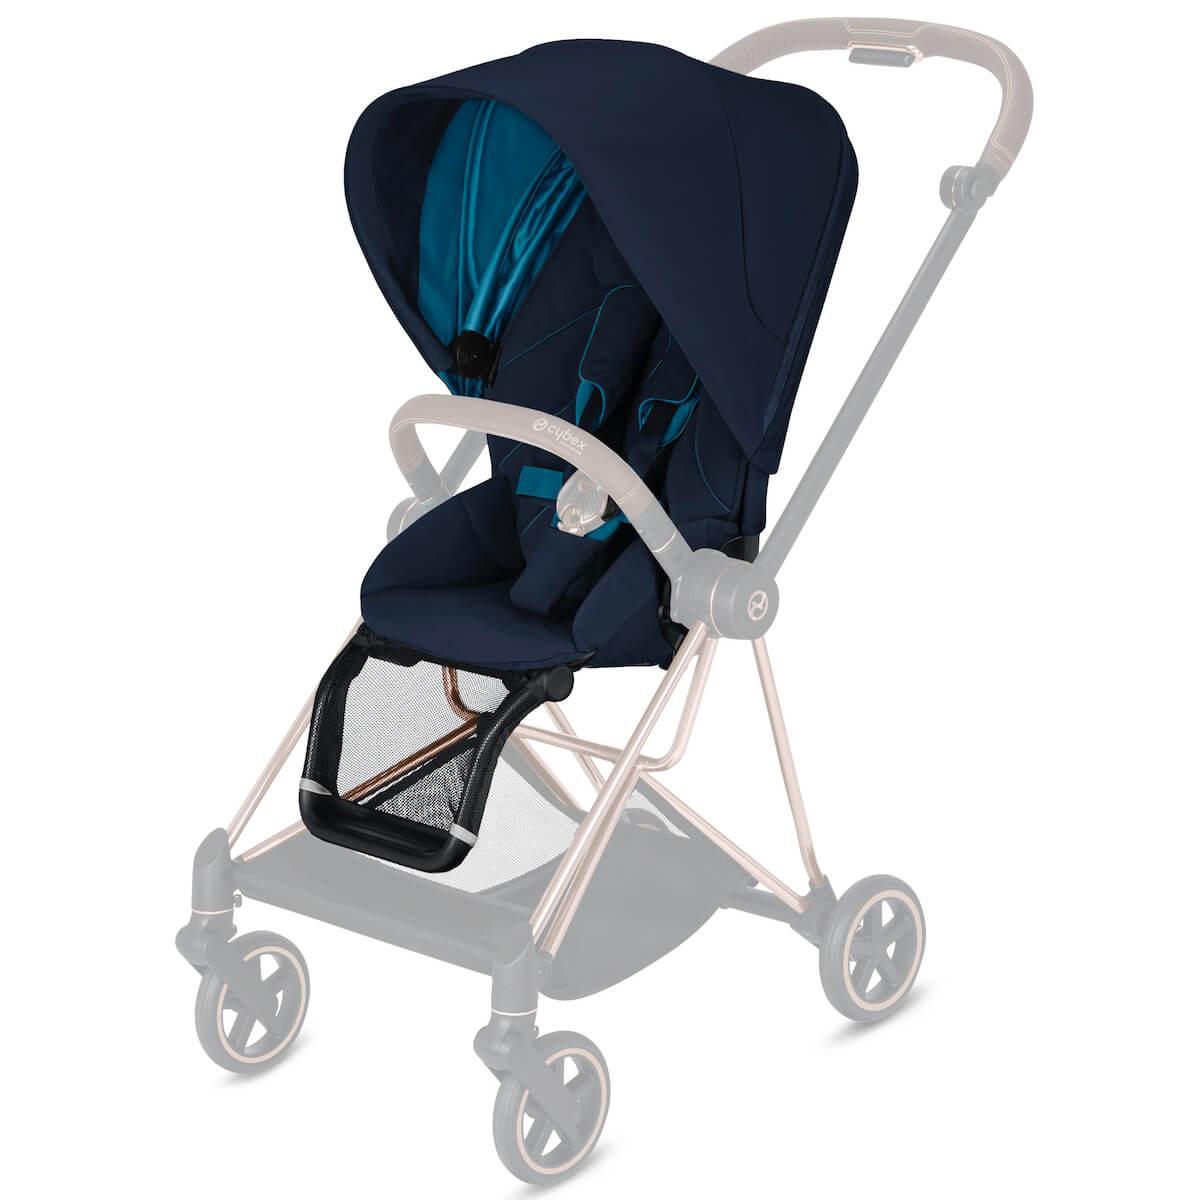 Seat Pack MIOS Cybex Nautical Blue